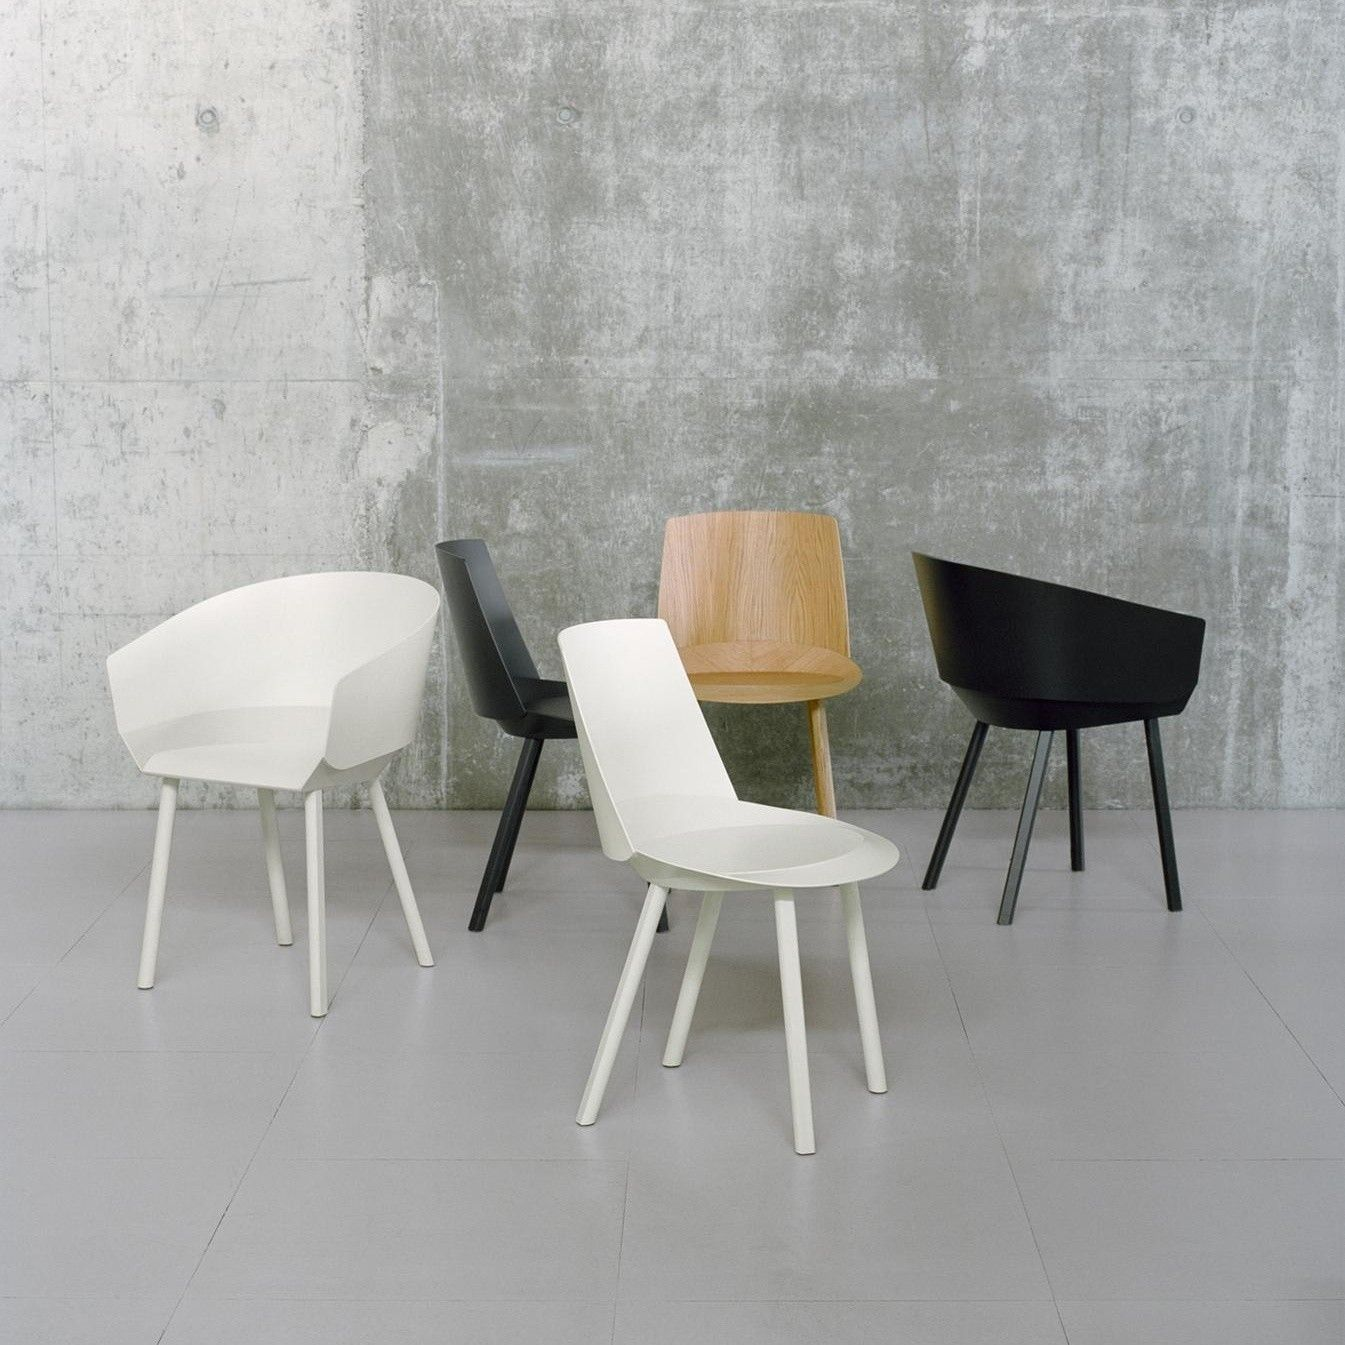 e15 CH04 Houdini Armlehnstuhl (mit Bildern) Stuhl design